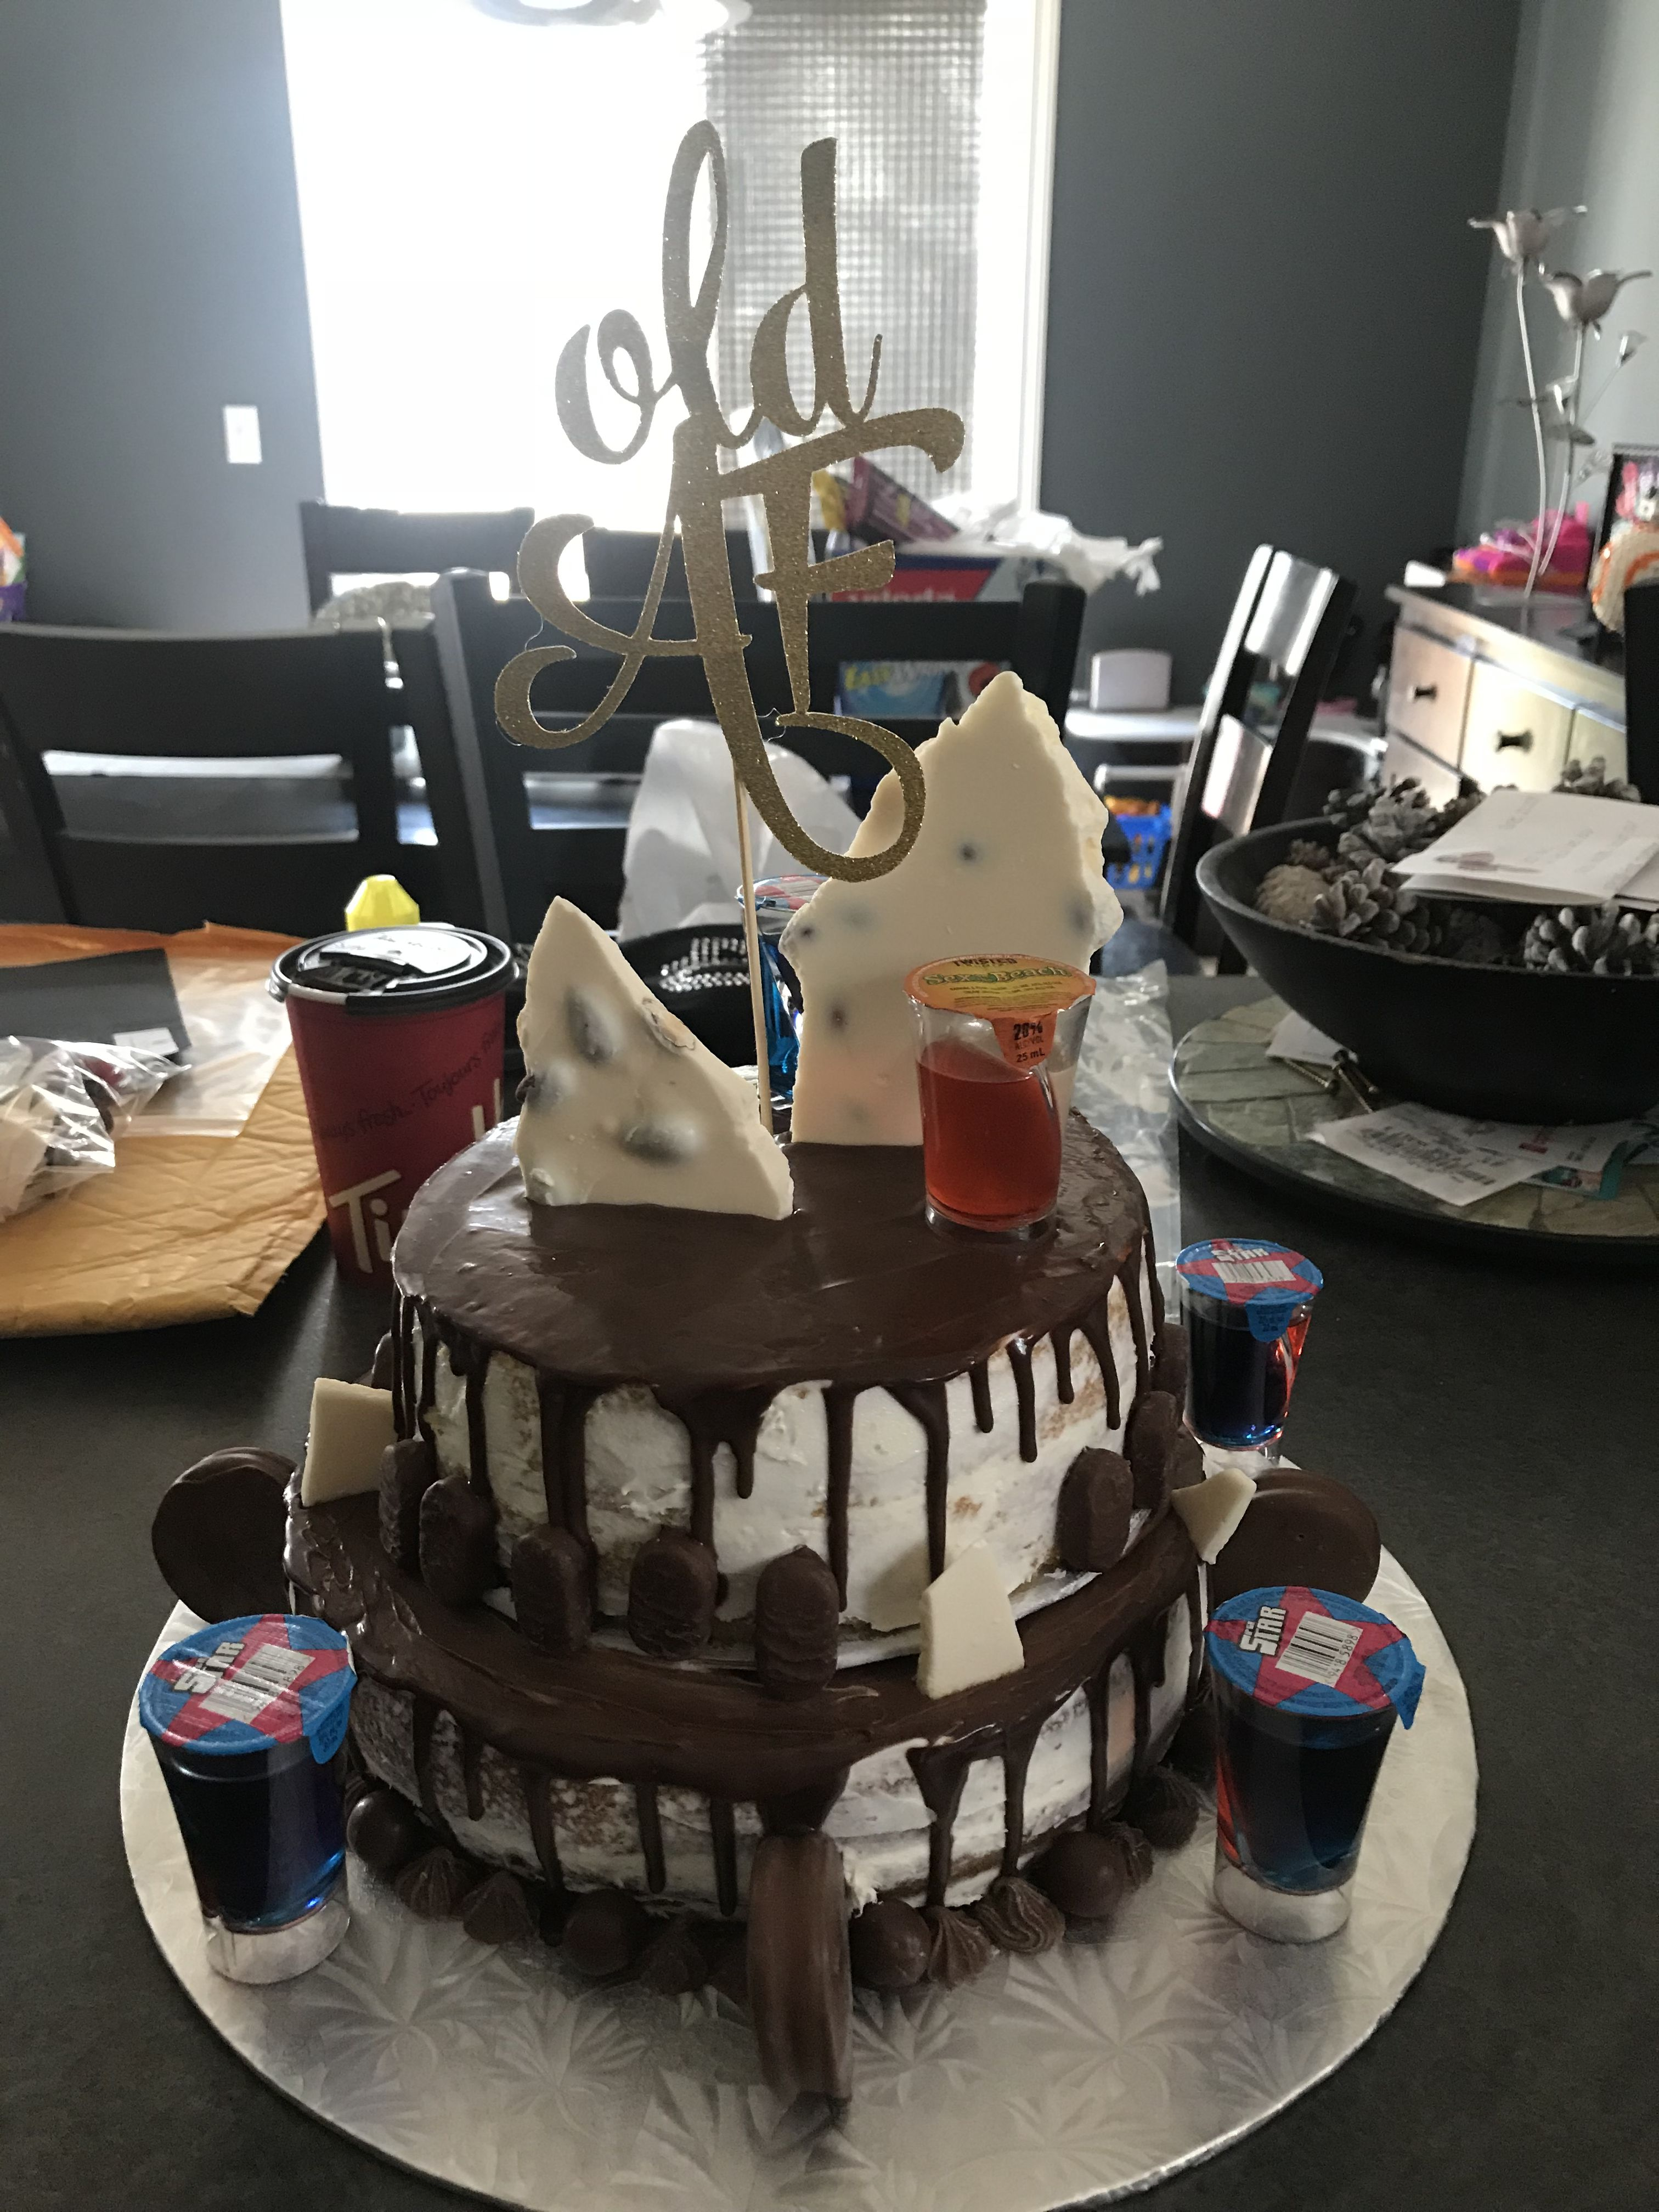 40th birthday cake 40th birthday cakes cake birthday cake